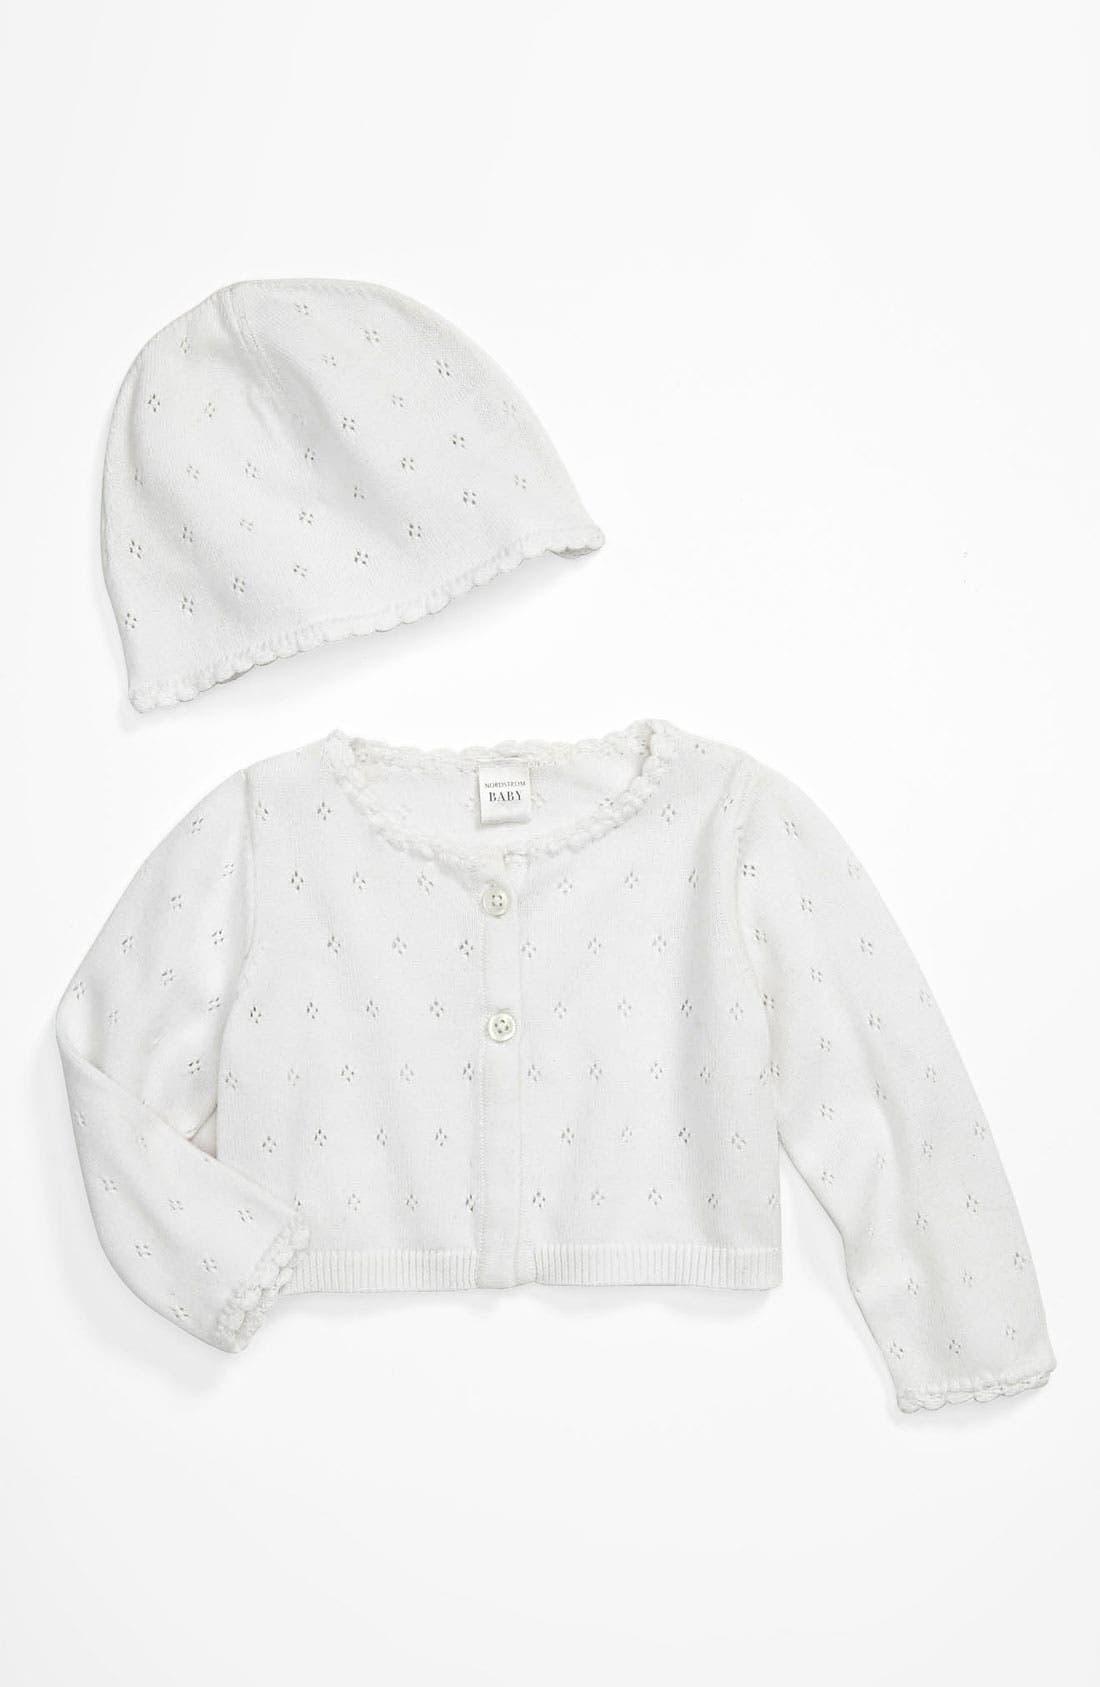 Alternate Image 1 Selected - Nordstrom Baby 'Sweet Pointelle' Cardigan & Hat (Infant)